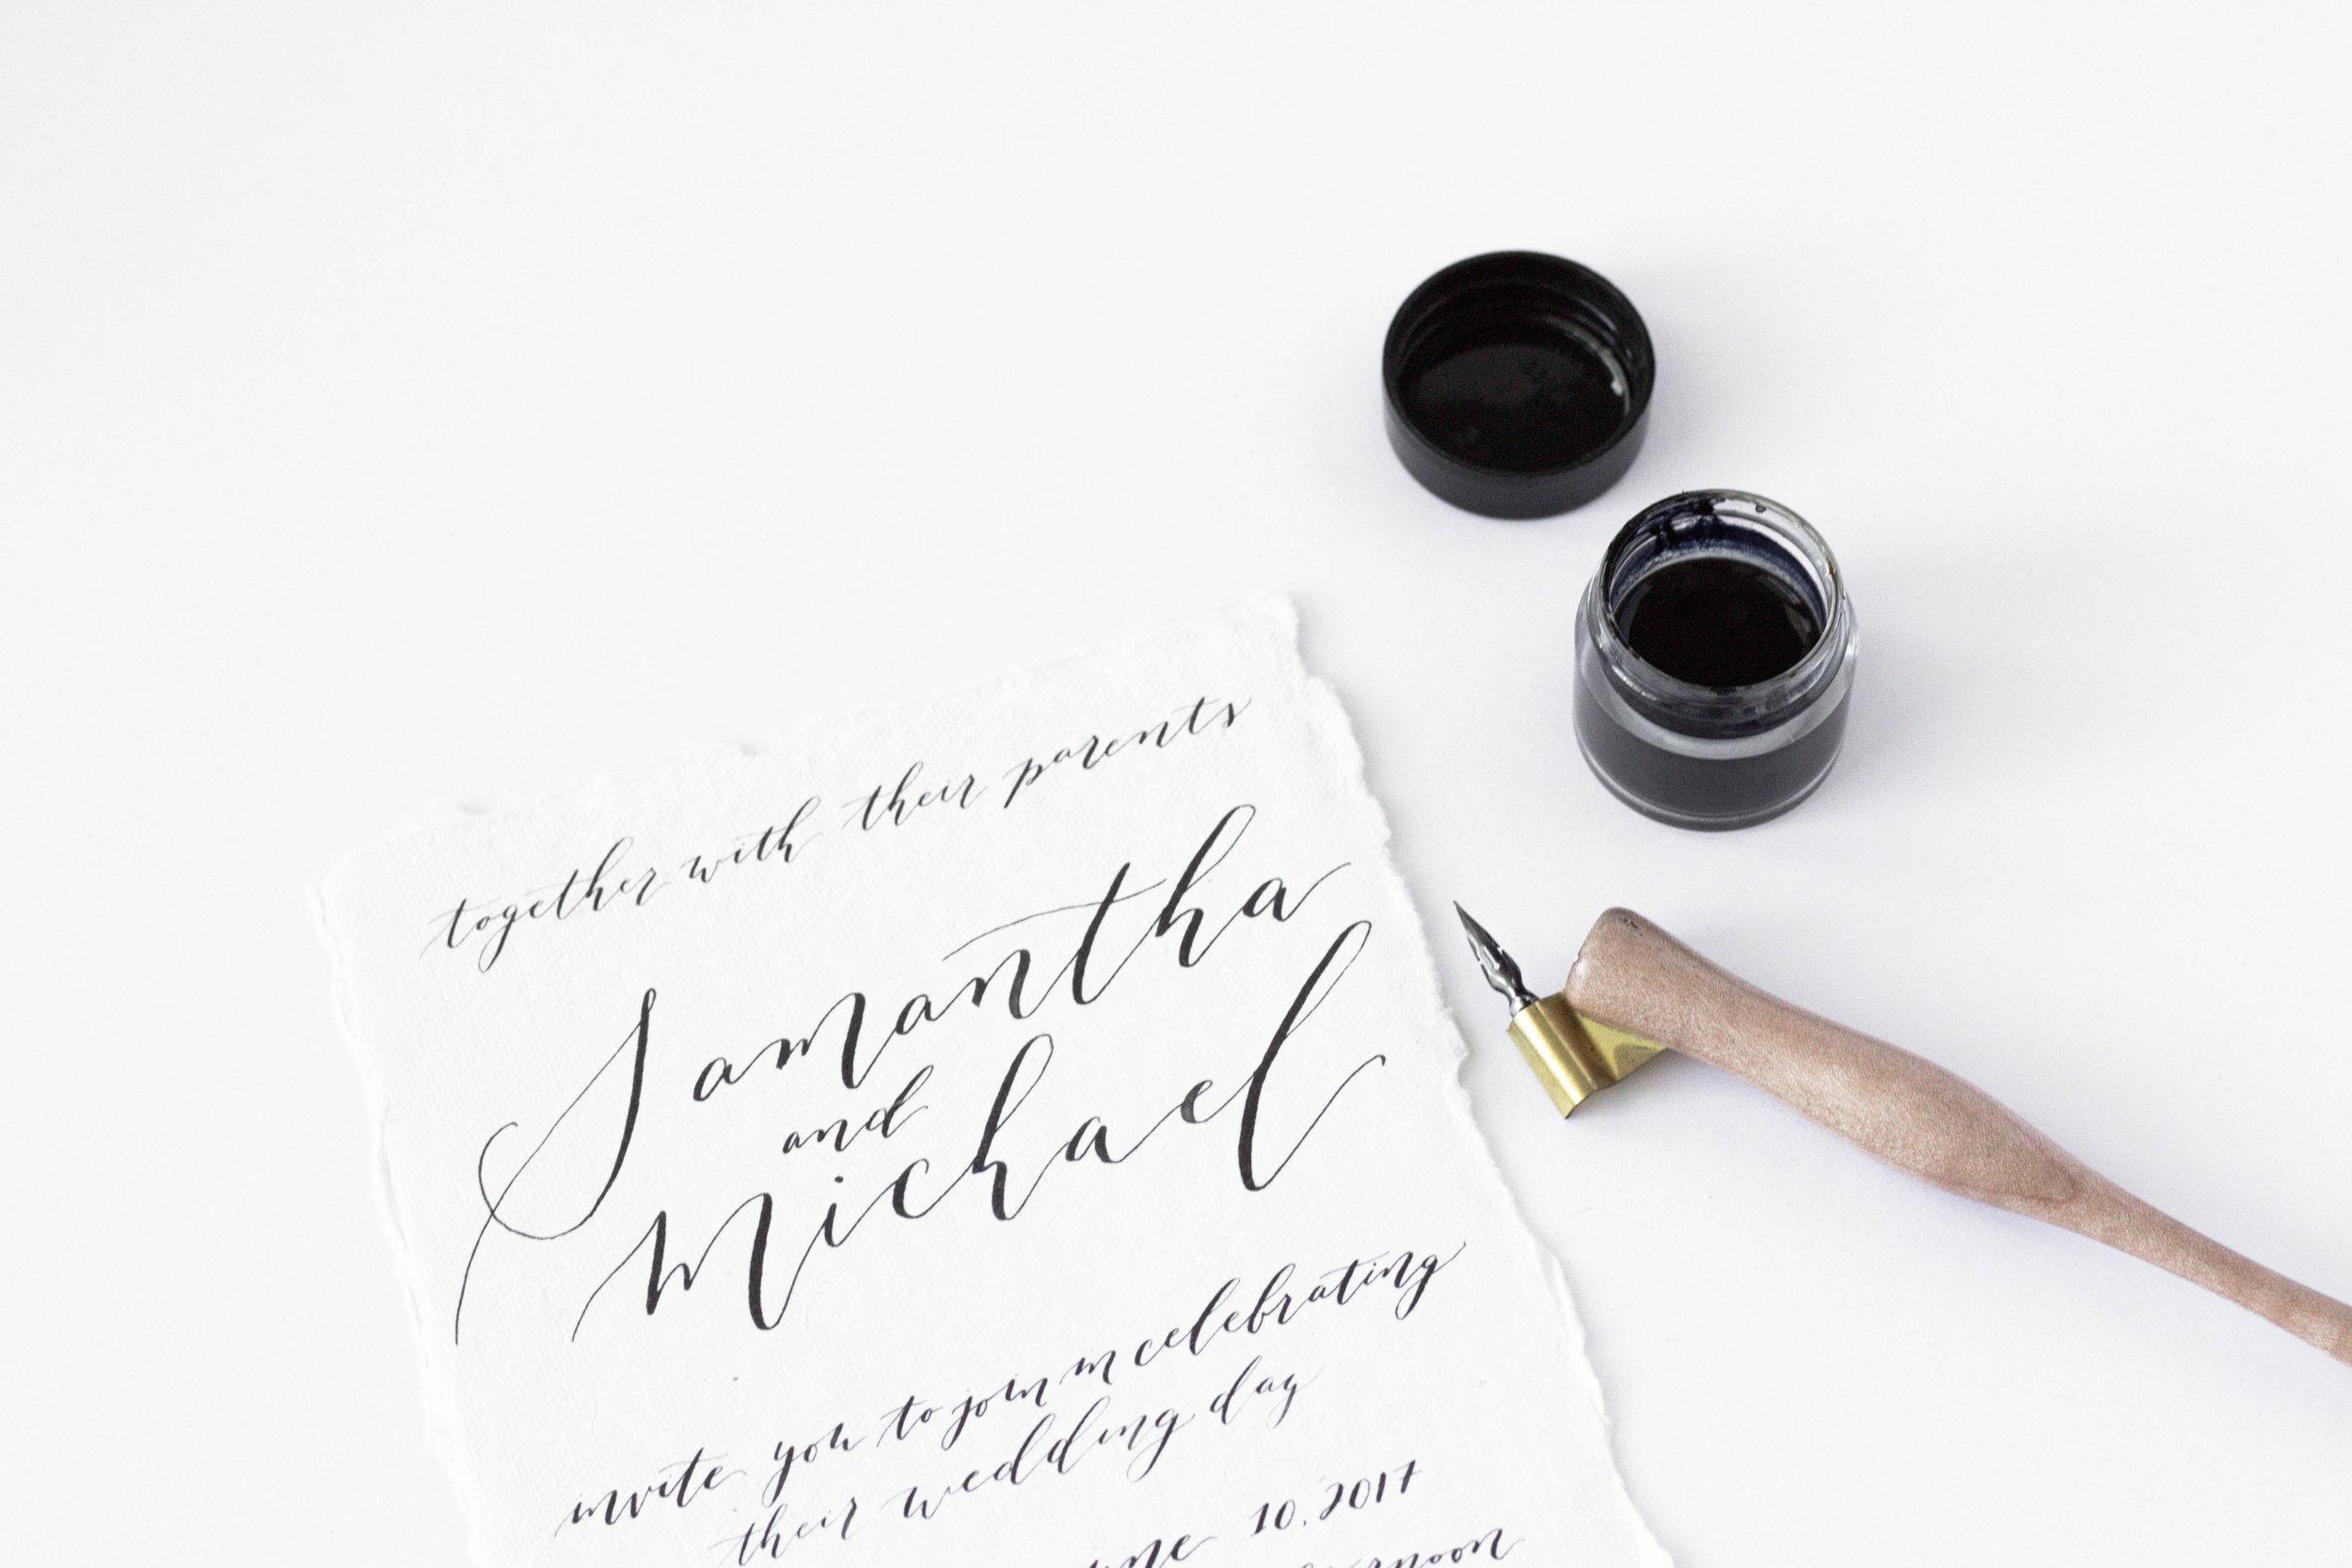 Minimalist Wedding Invitations - Calligraphy Wedding Invitation Suite - Black and White Invitations - True North Paper Co.